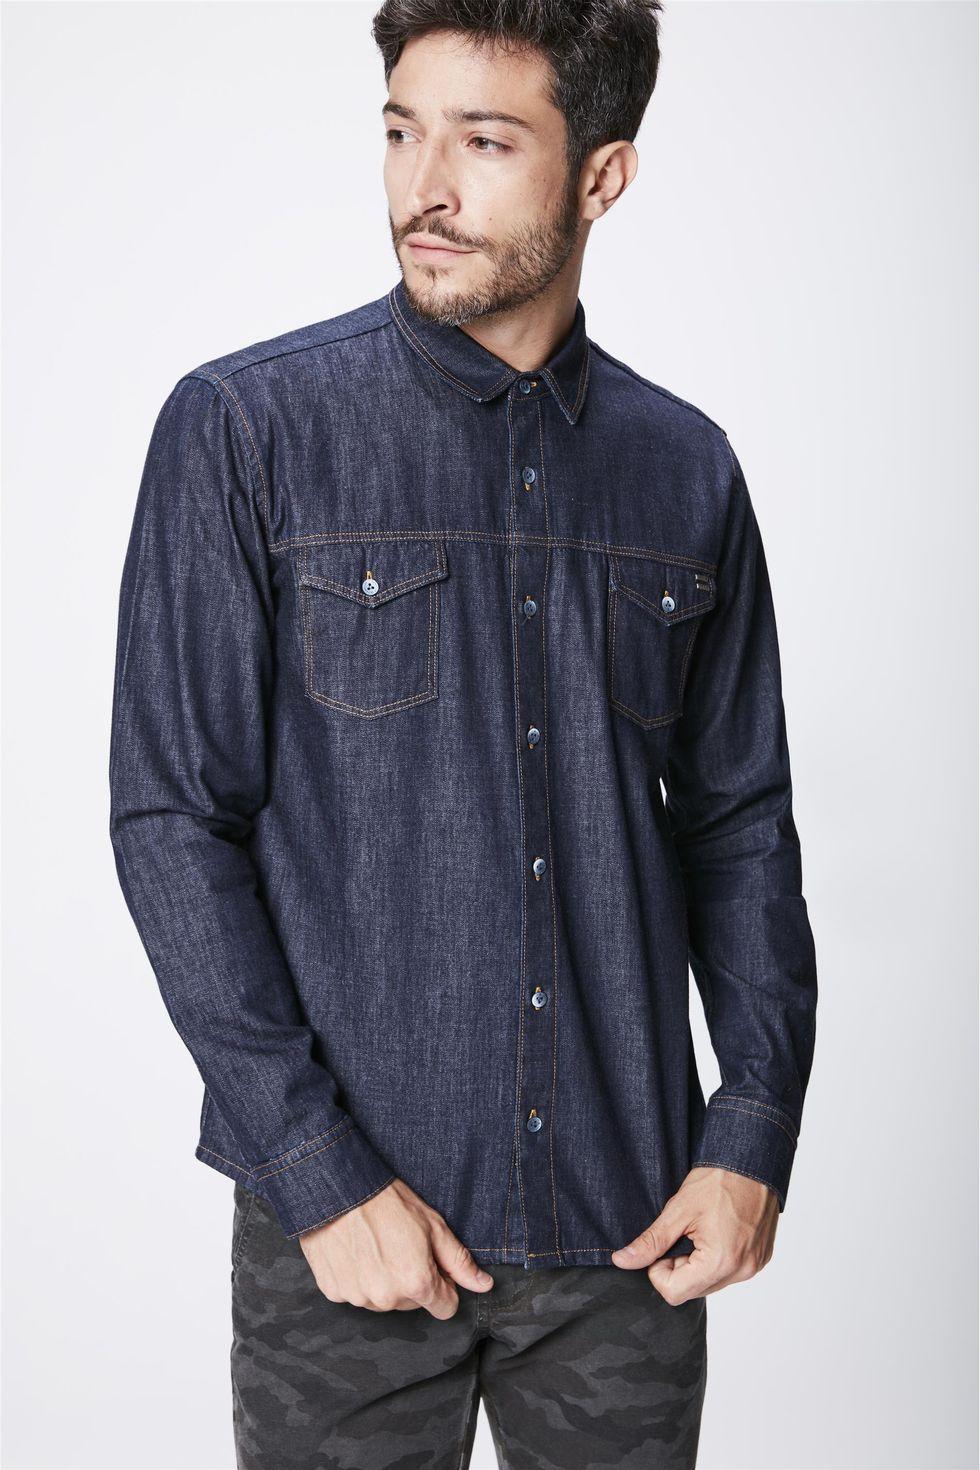 Camisa-Jeans-Escuro-Masculina-Frente--